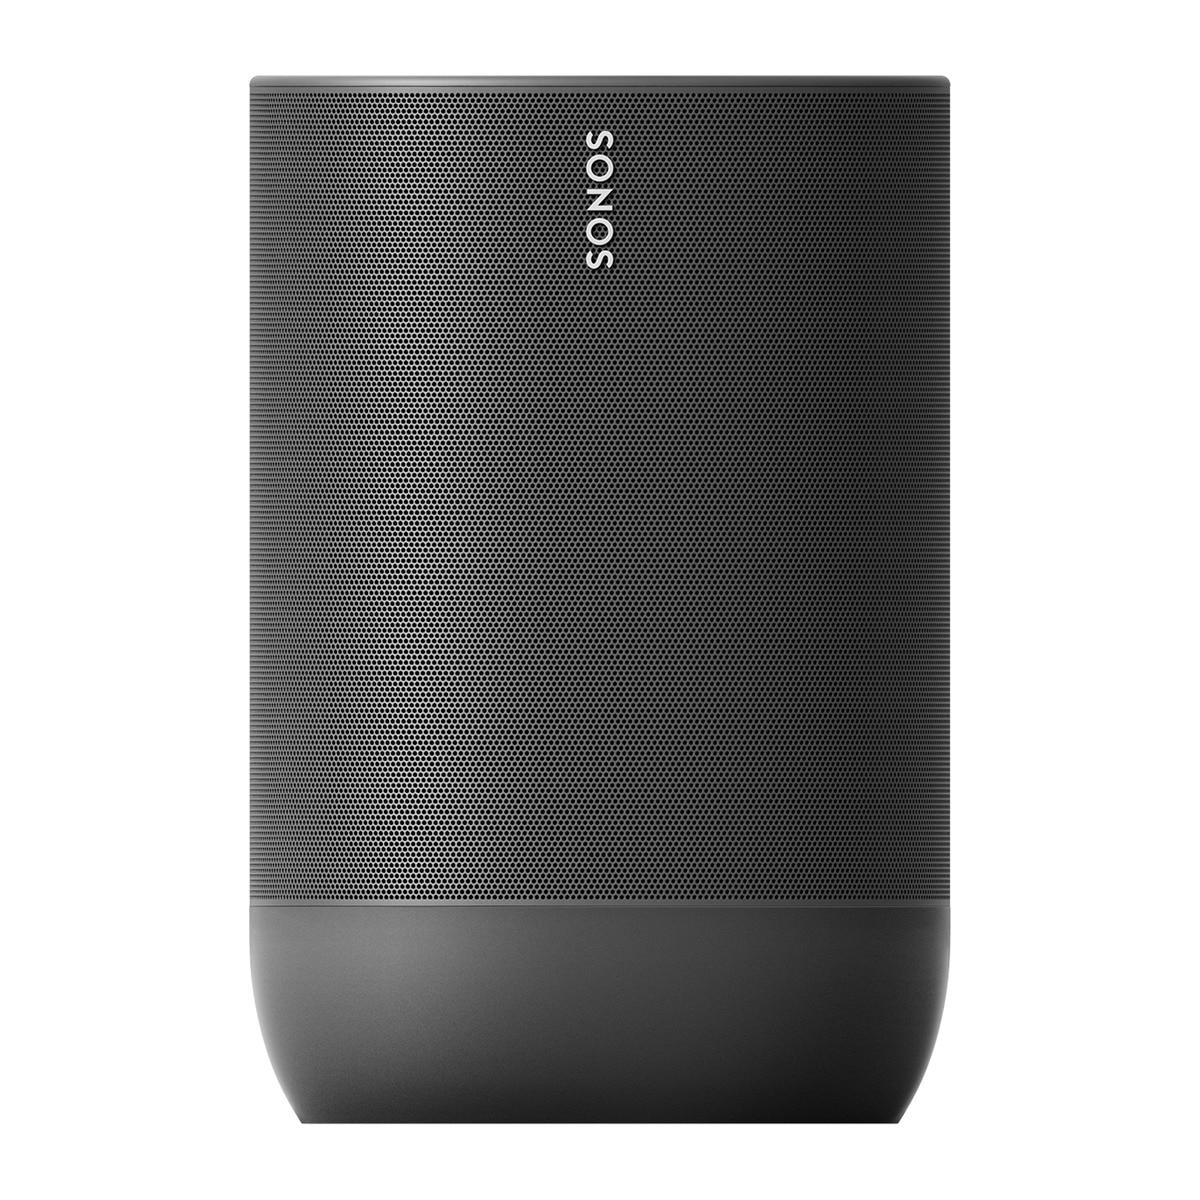 Sonos Move Gray Multiroom Portable Speaker and Voice Control - £285.51 @ El Corte Ingles